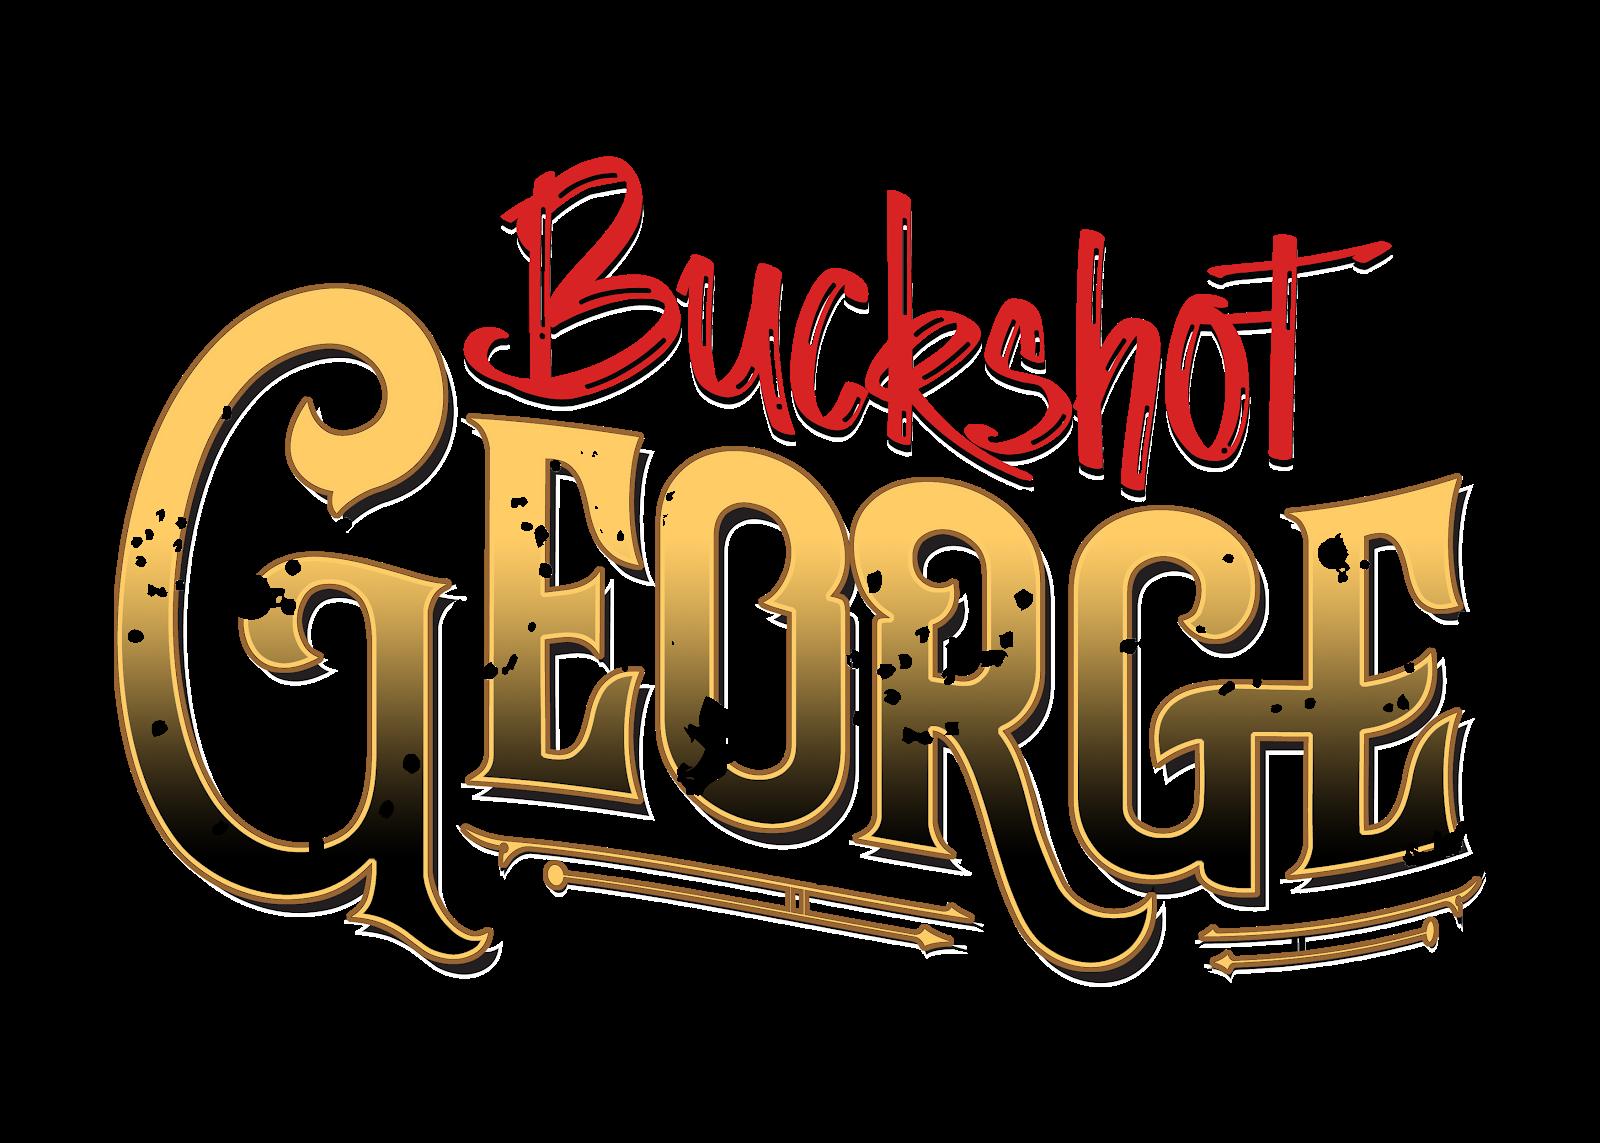 BUCKSHOT GEORGE